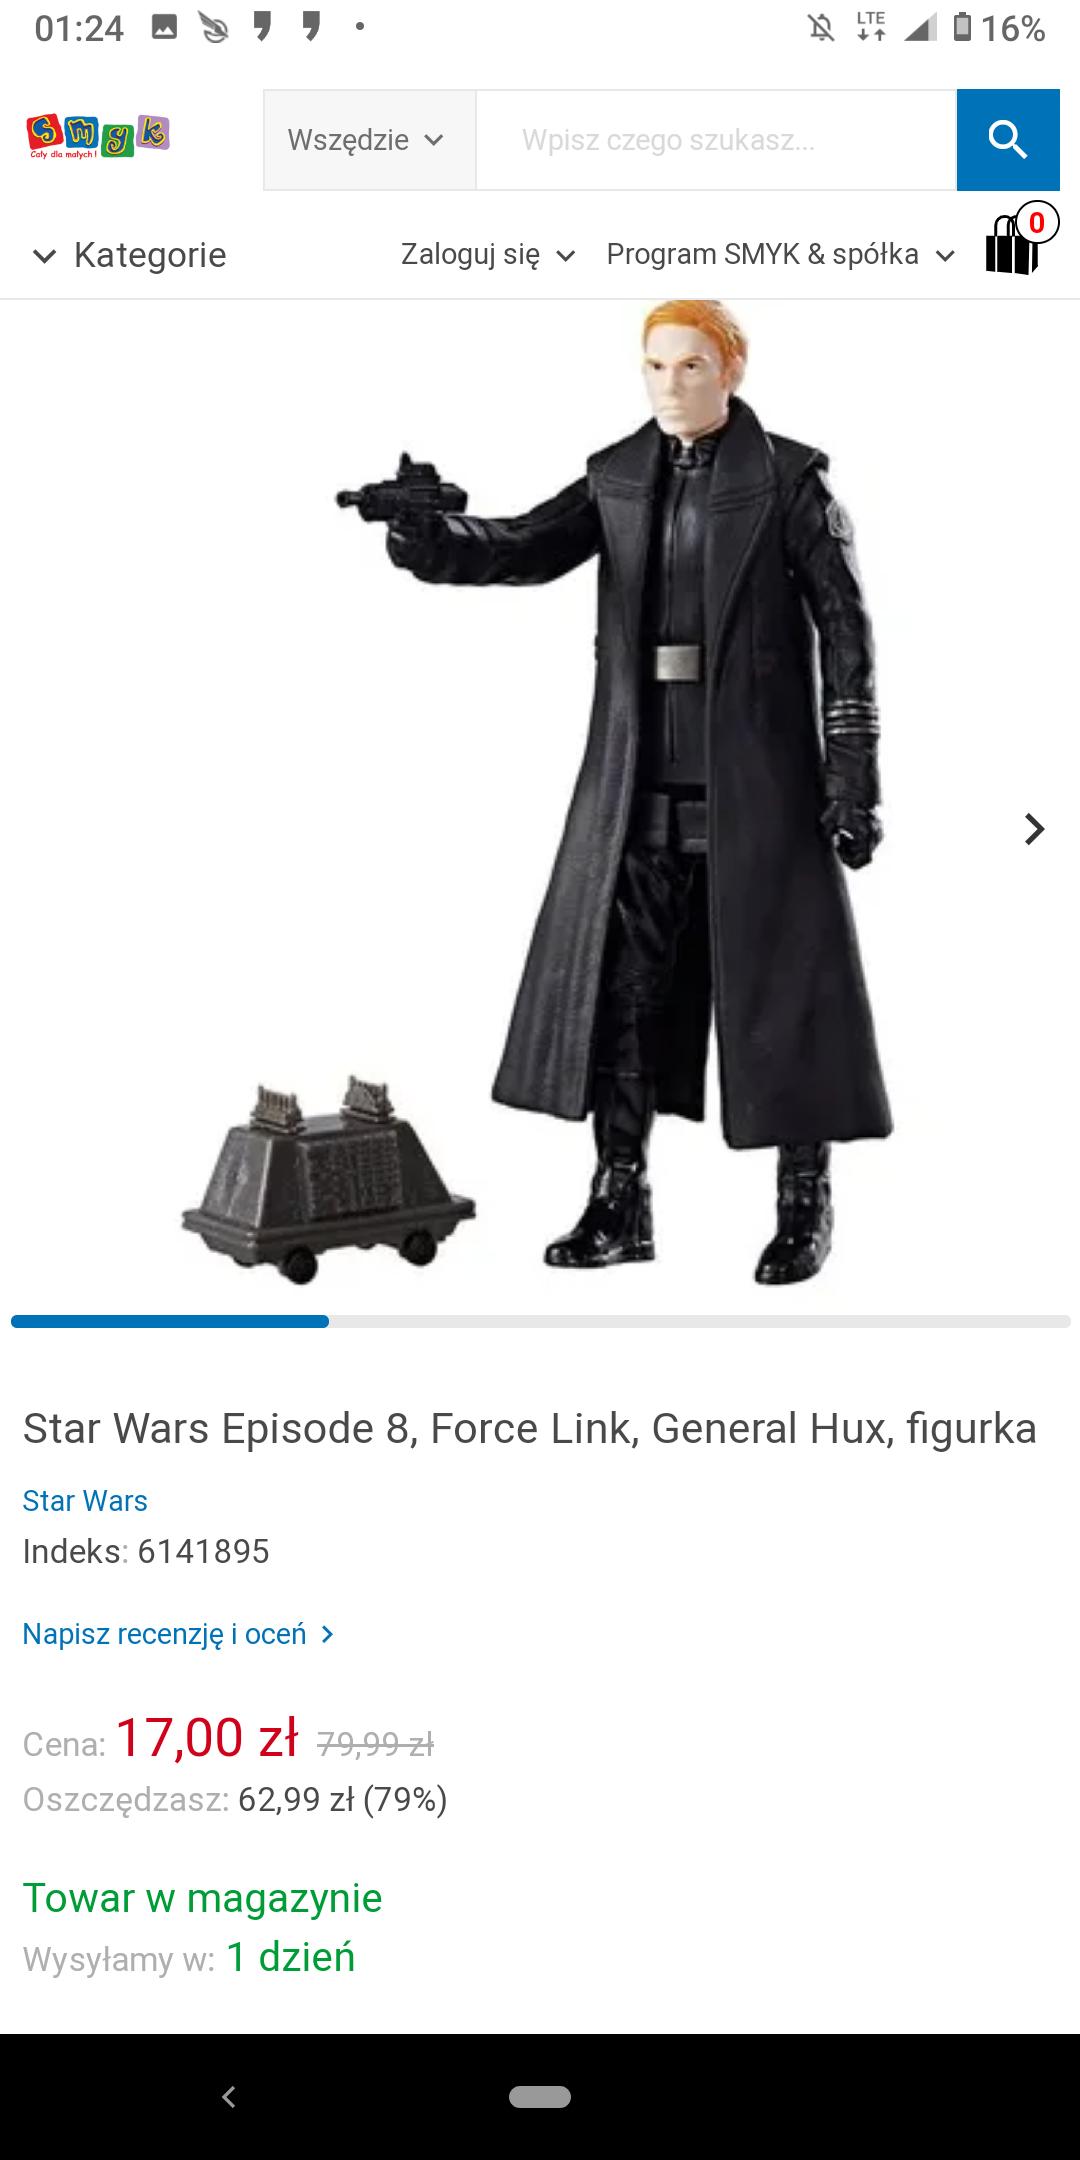 Star Wars figurki Force Link